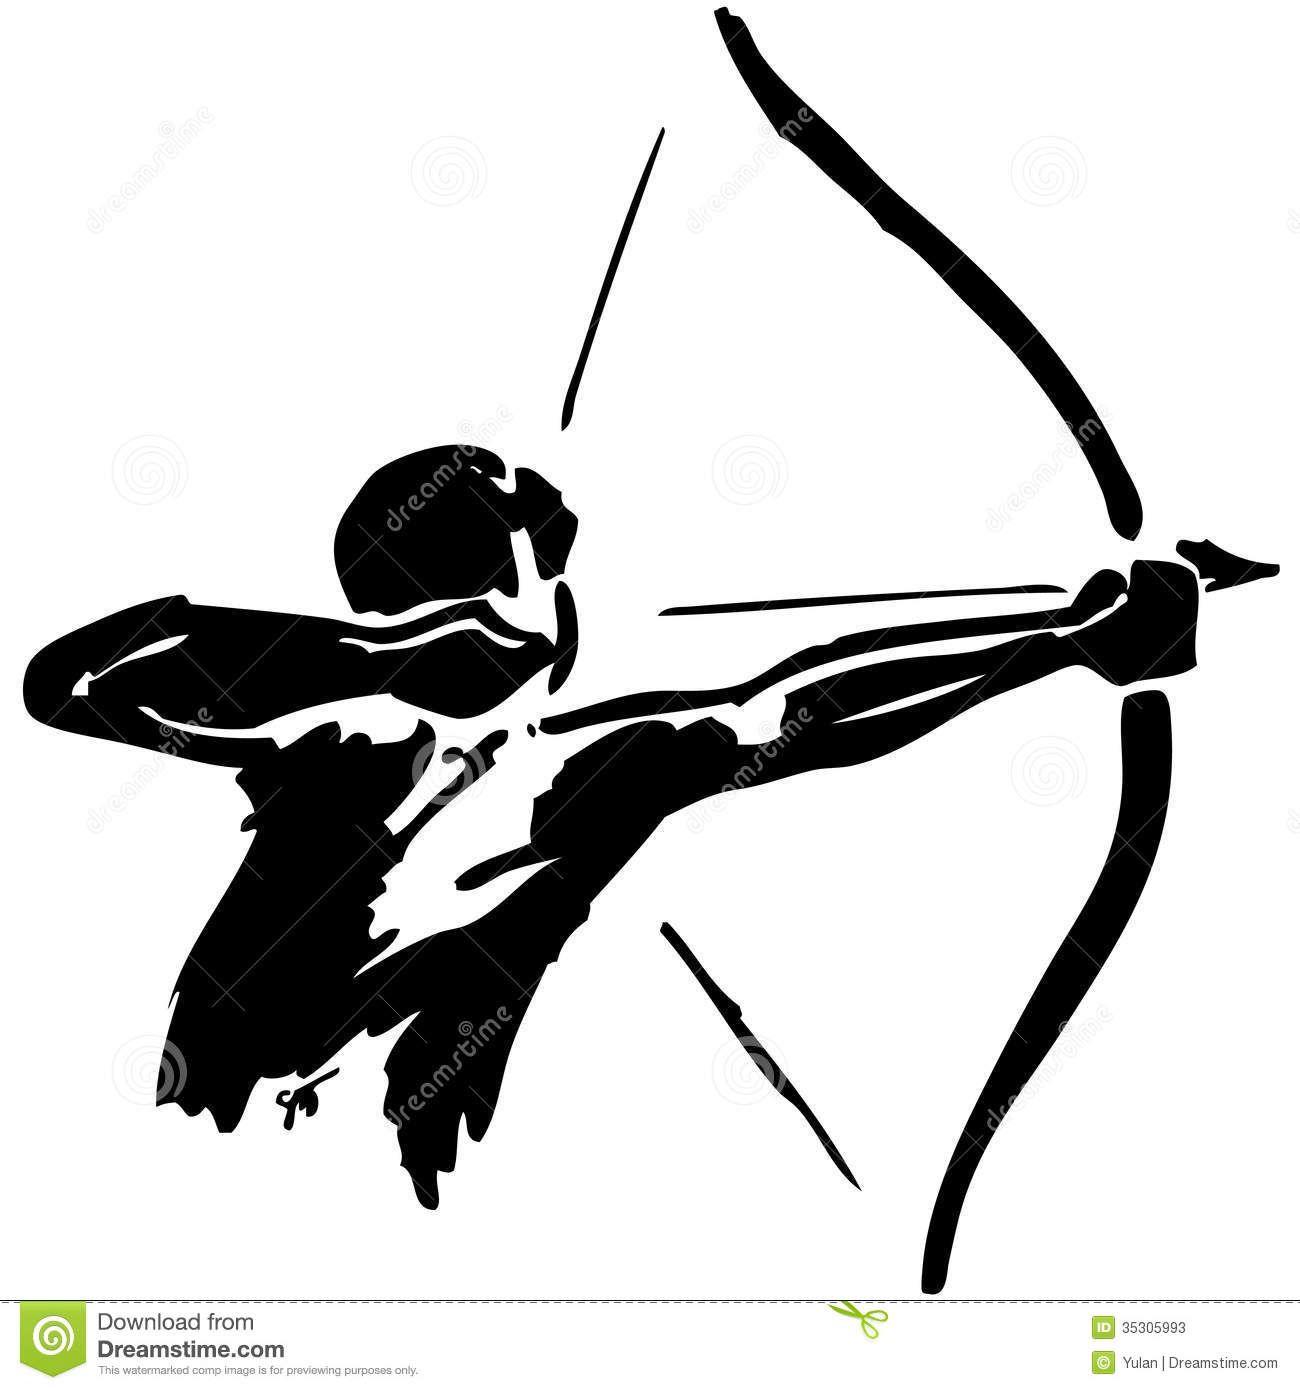 Archer clipart. Archery stock illustrations vectors